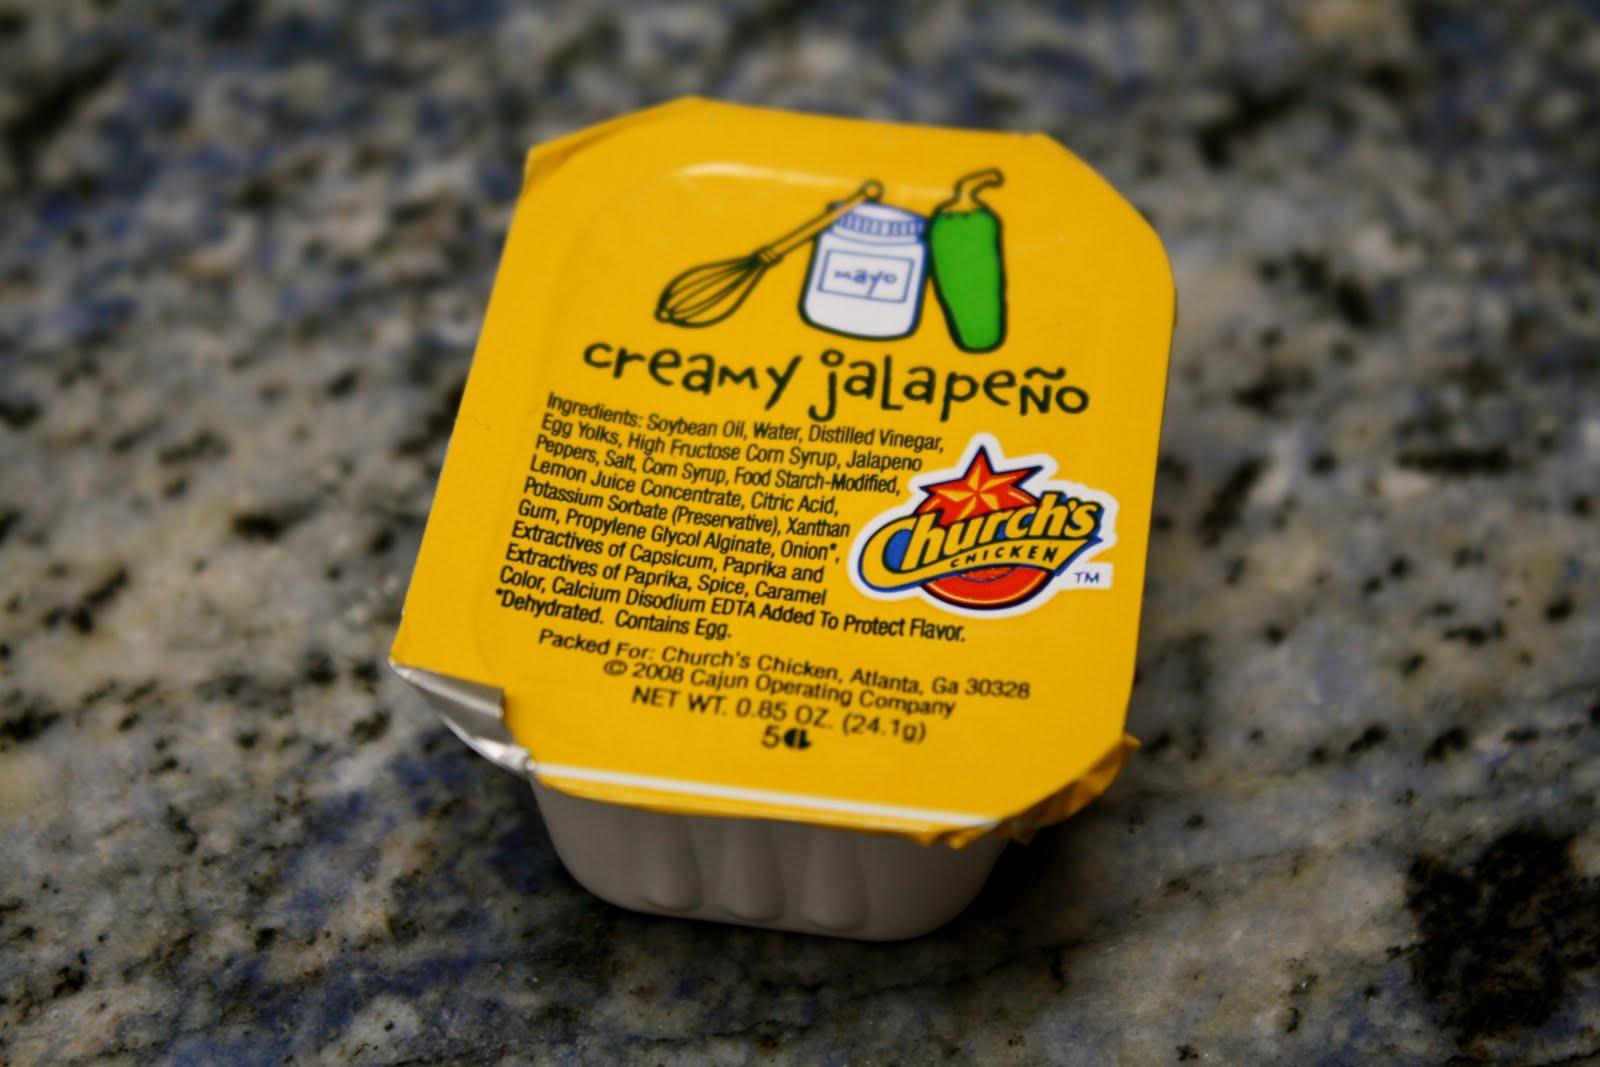 Church's Creamy Jalapeno Sauce